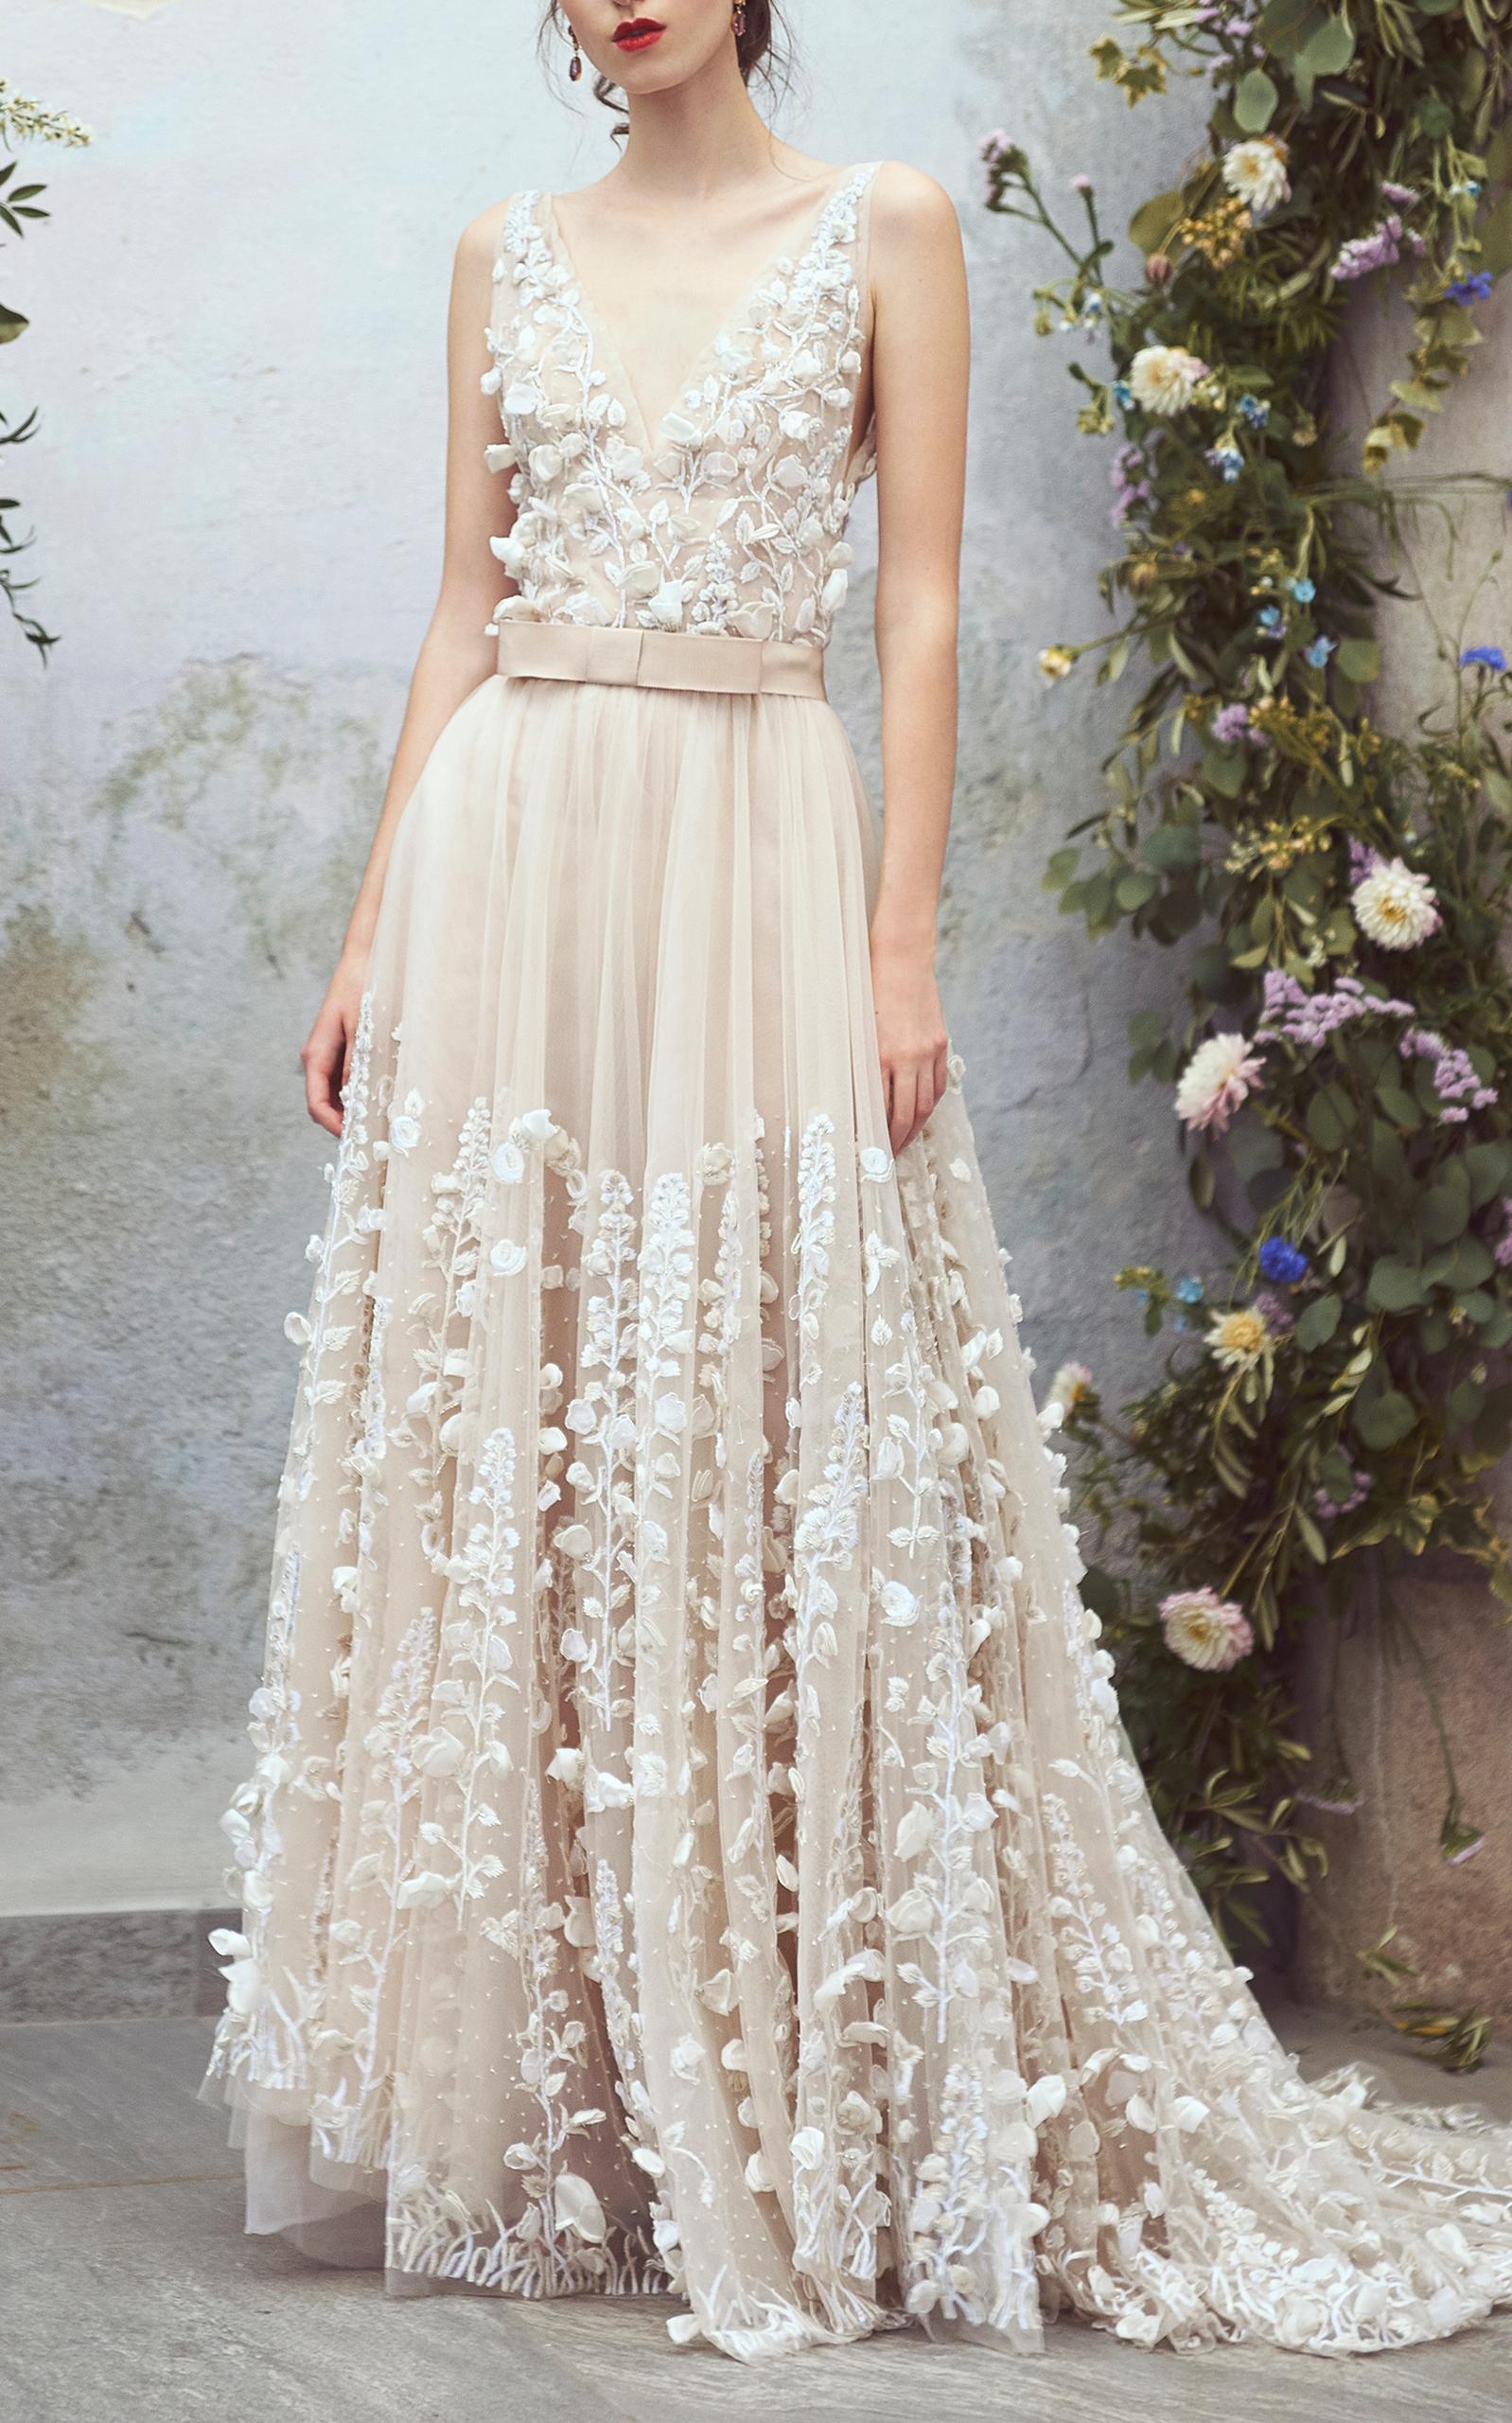 35e069edf8 Organdy Floral Embroidered Ball Gown by Luisa Beccaria   Moda Operandi